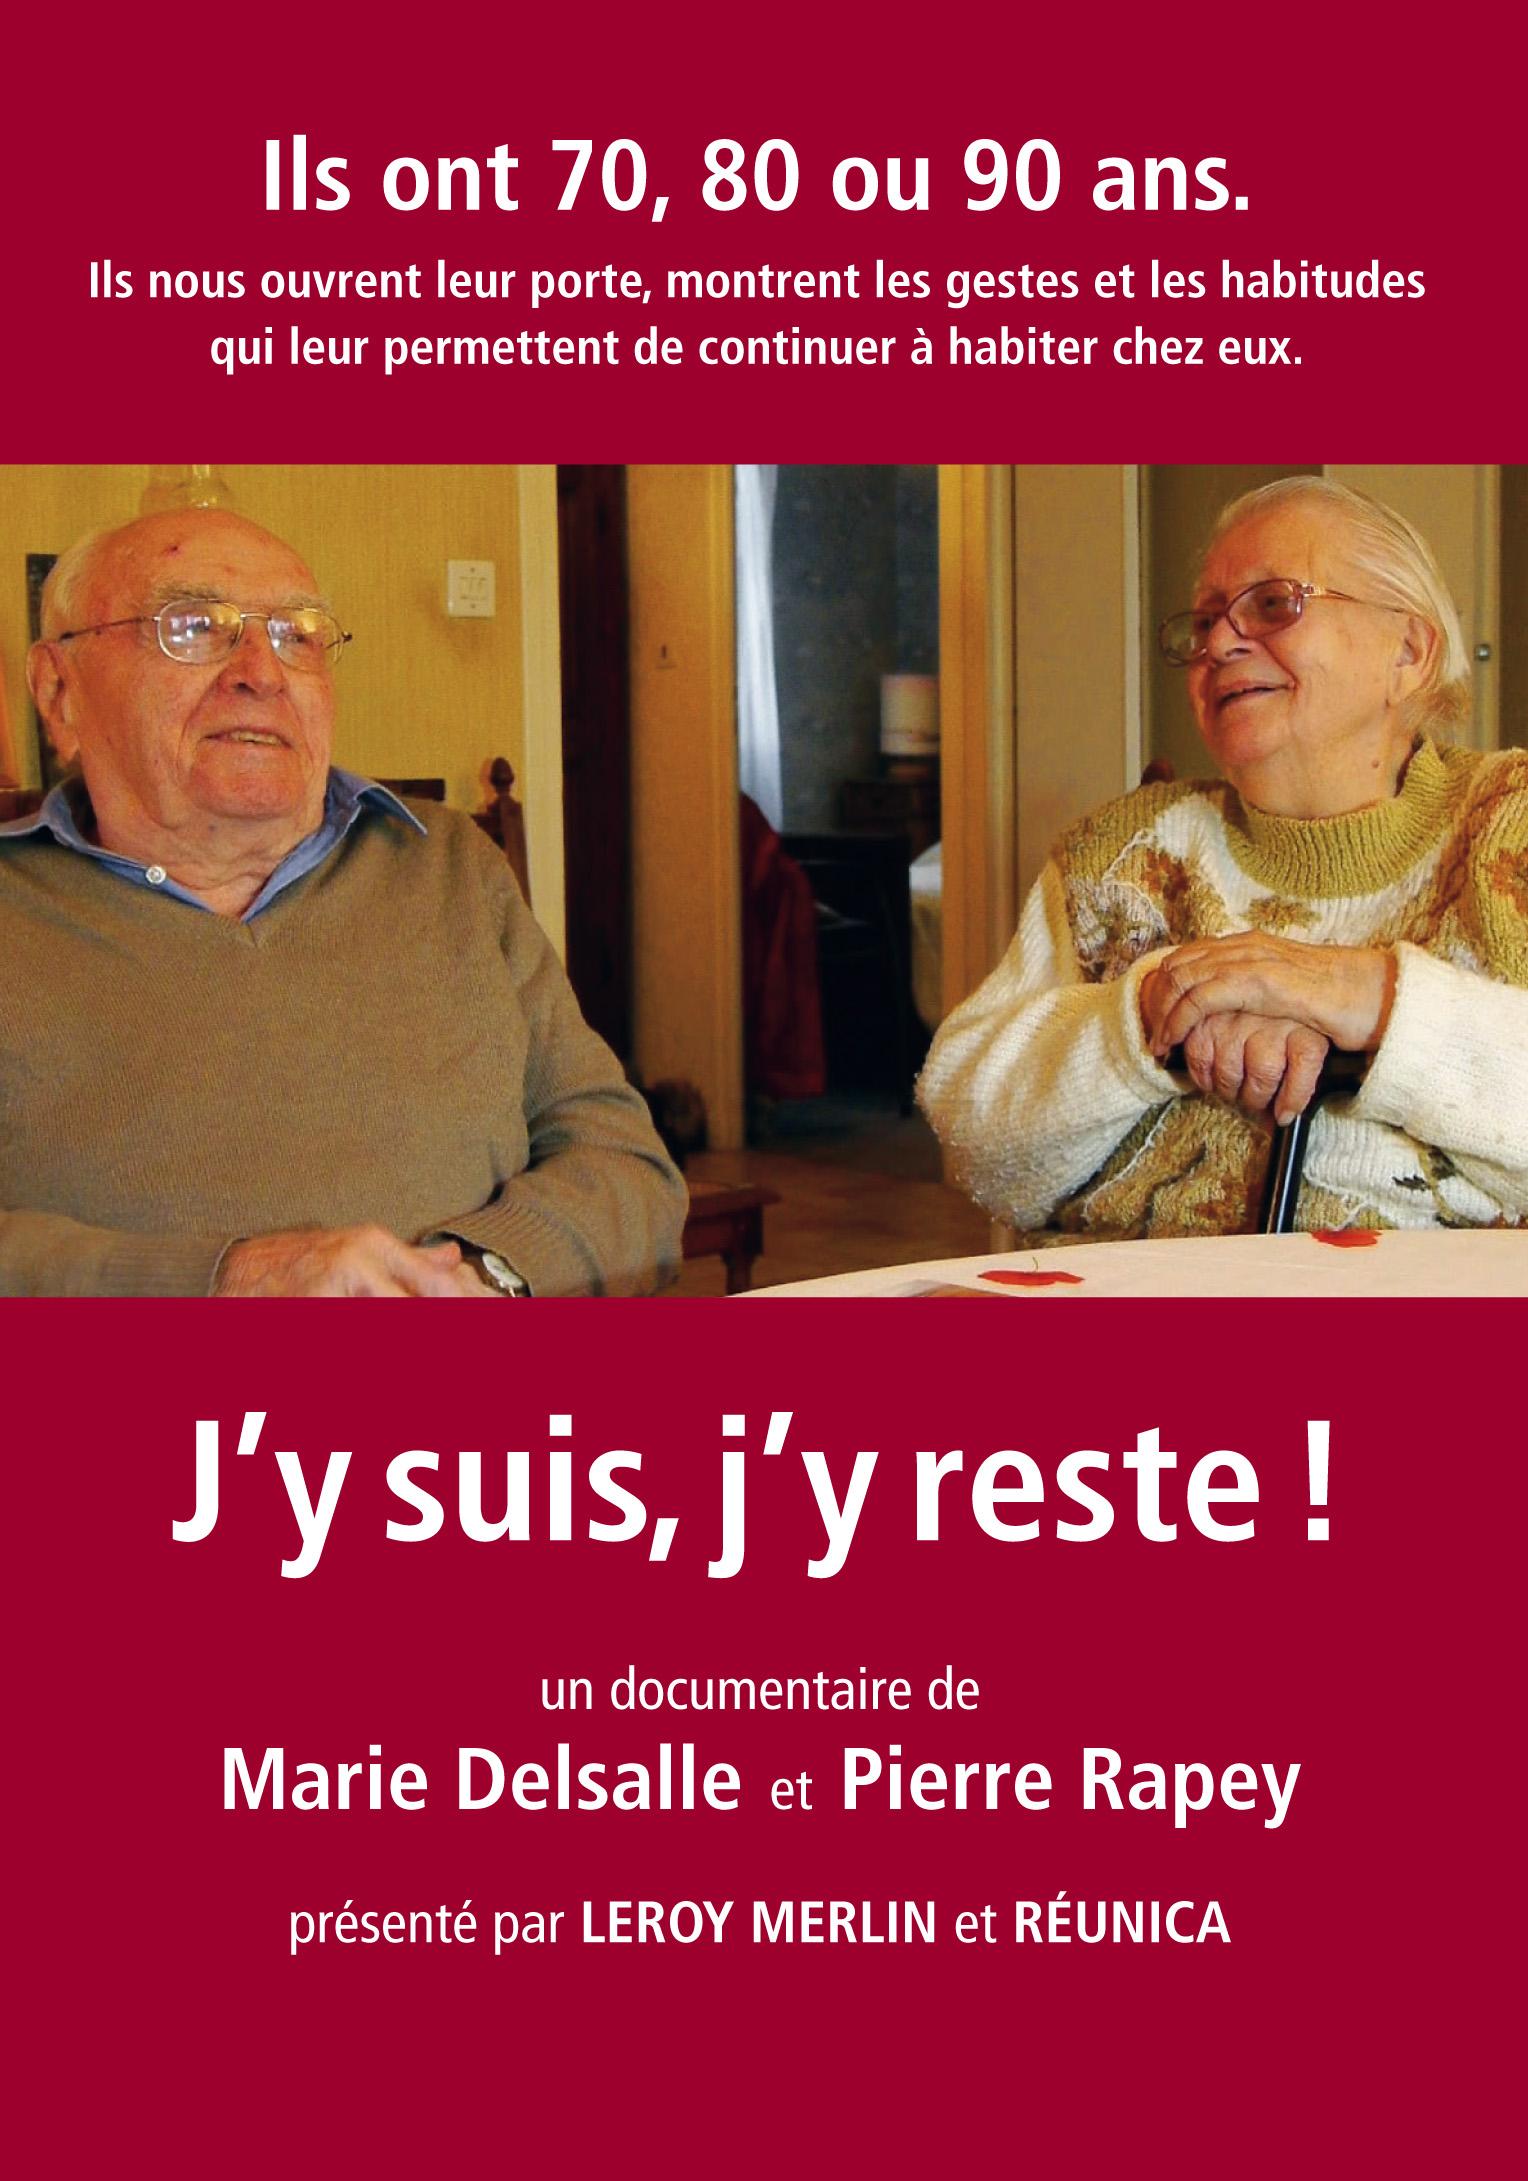 J Y Suis J Y Reste Volet 1 Le Film Documentaire Leroy Merlin Source